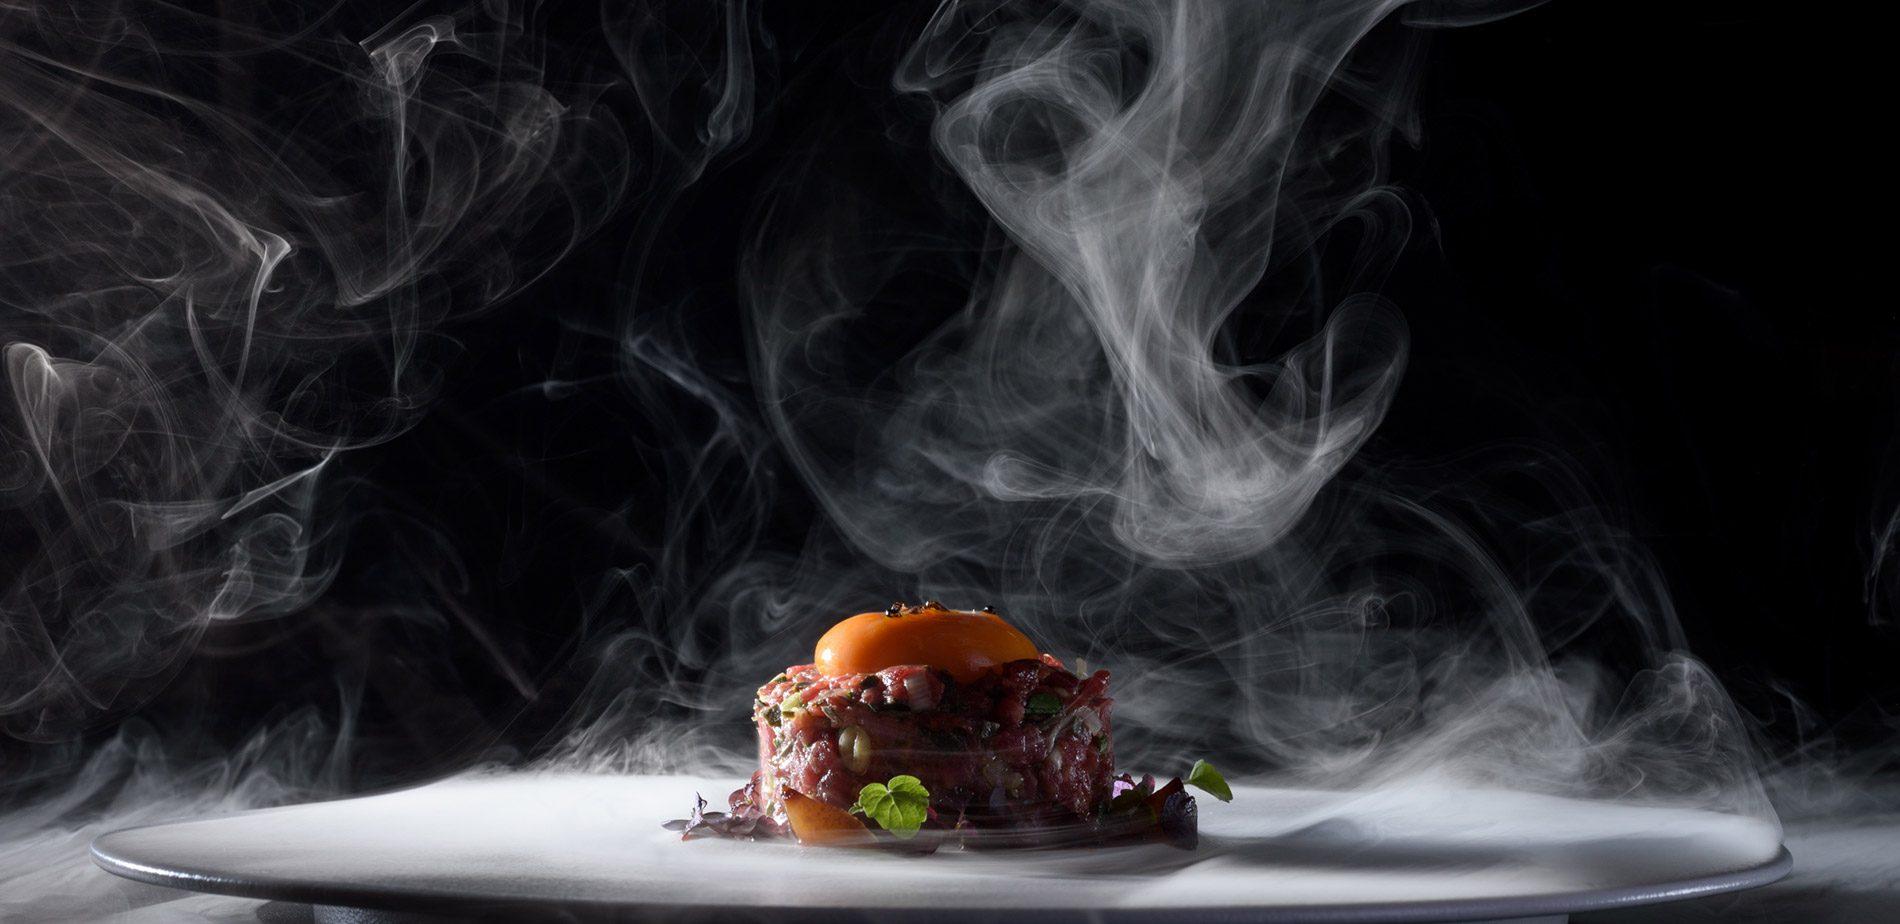 A gourmet hotel restaurant in Santorini redefines 'gastronomy'